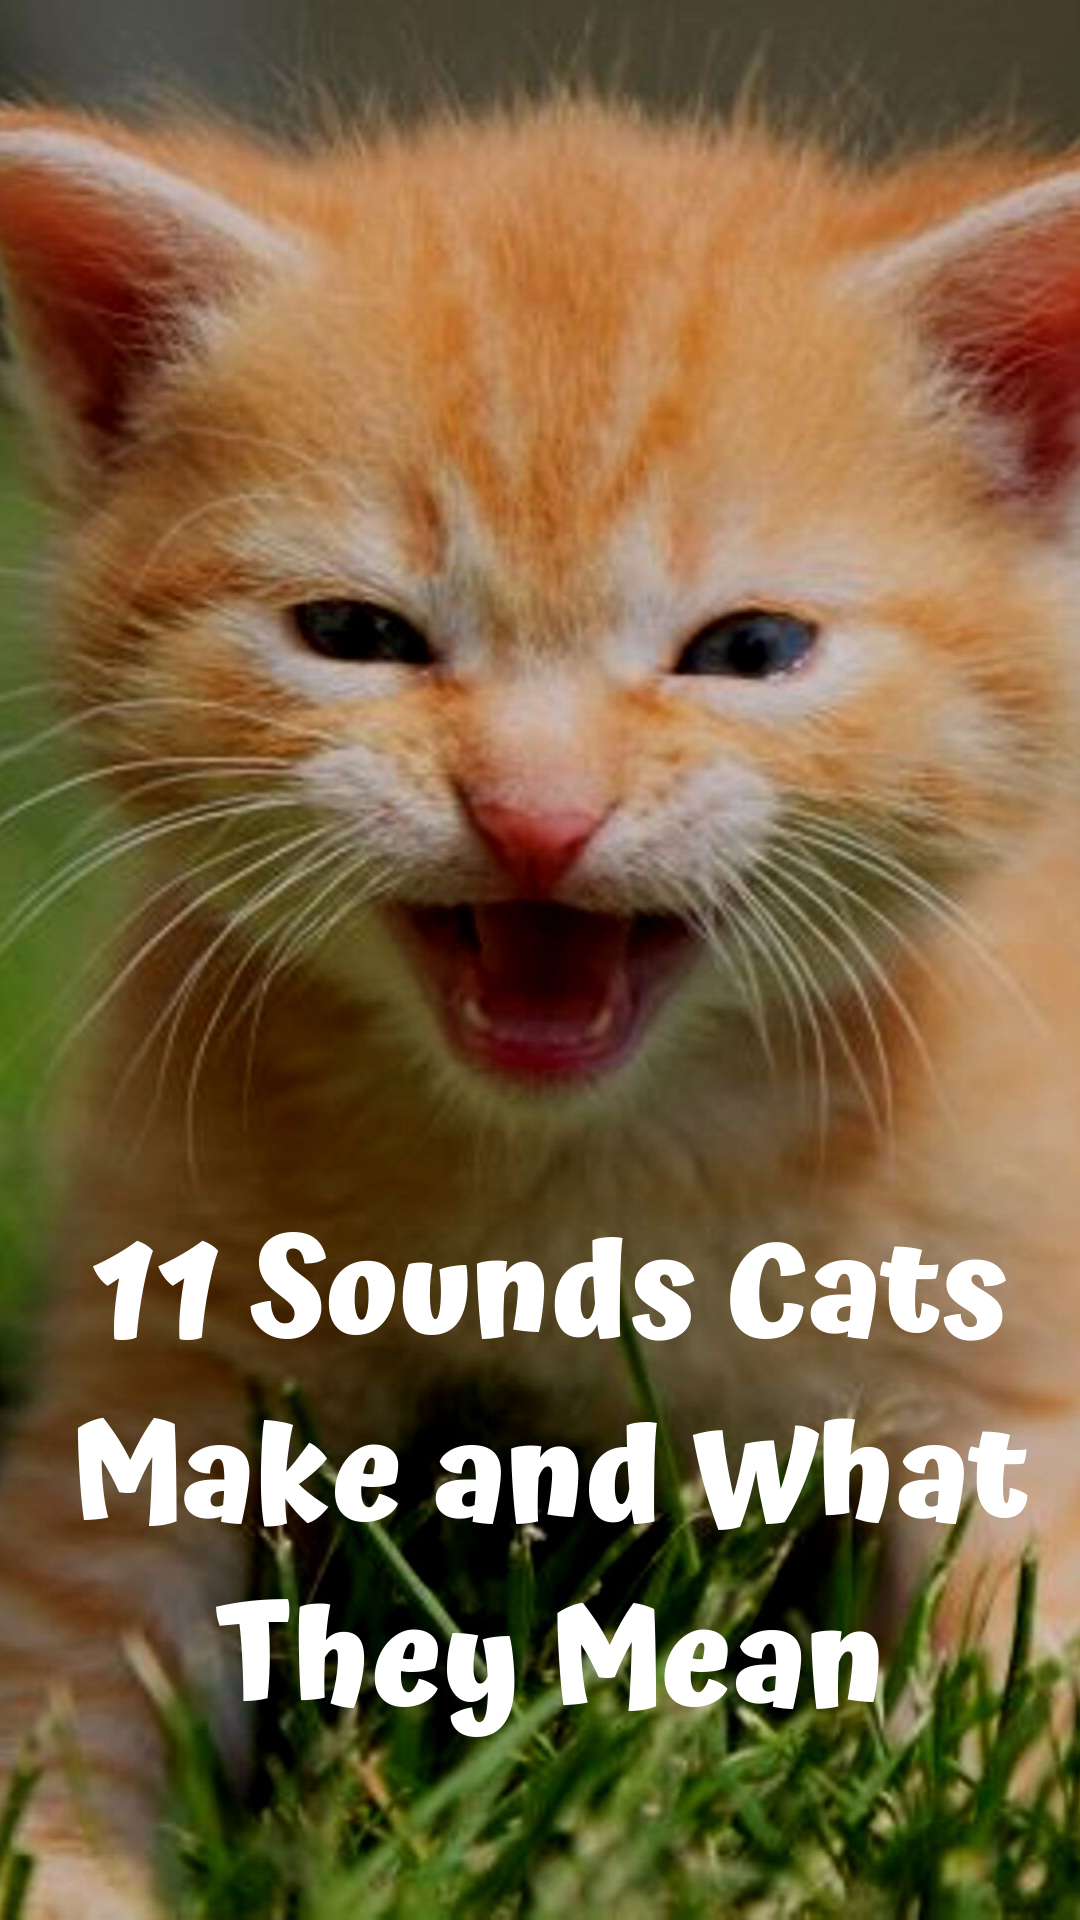 Sounds Good To Me Grumpy Cat Humor Grumpy Cat Quotes Grumpy Cat Meme